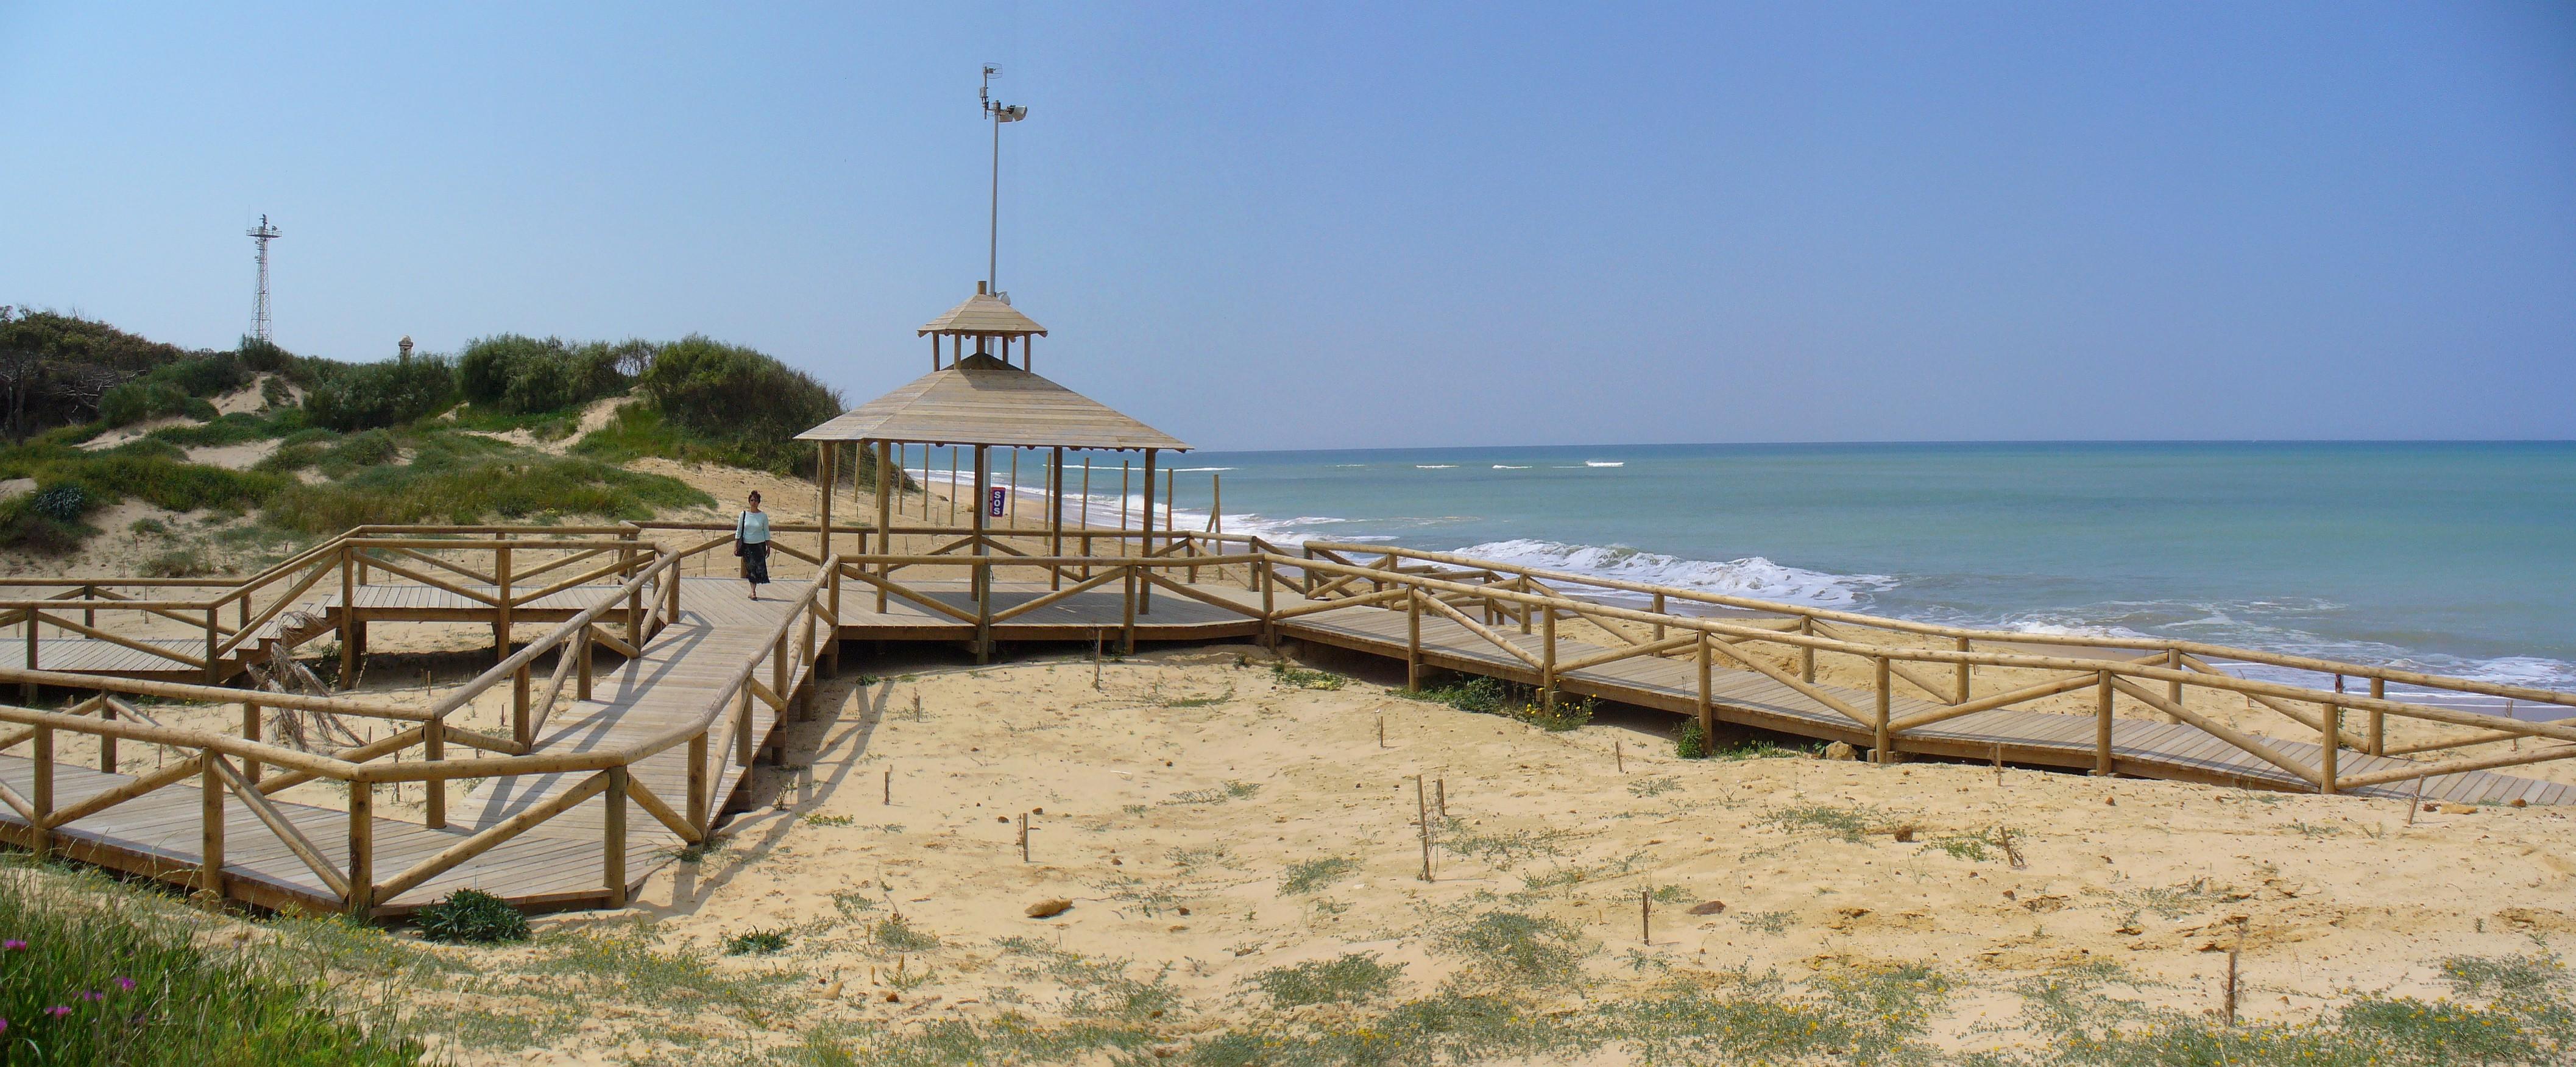 Foto playa Punta Candor. Playa de Punta Candor en Rota